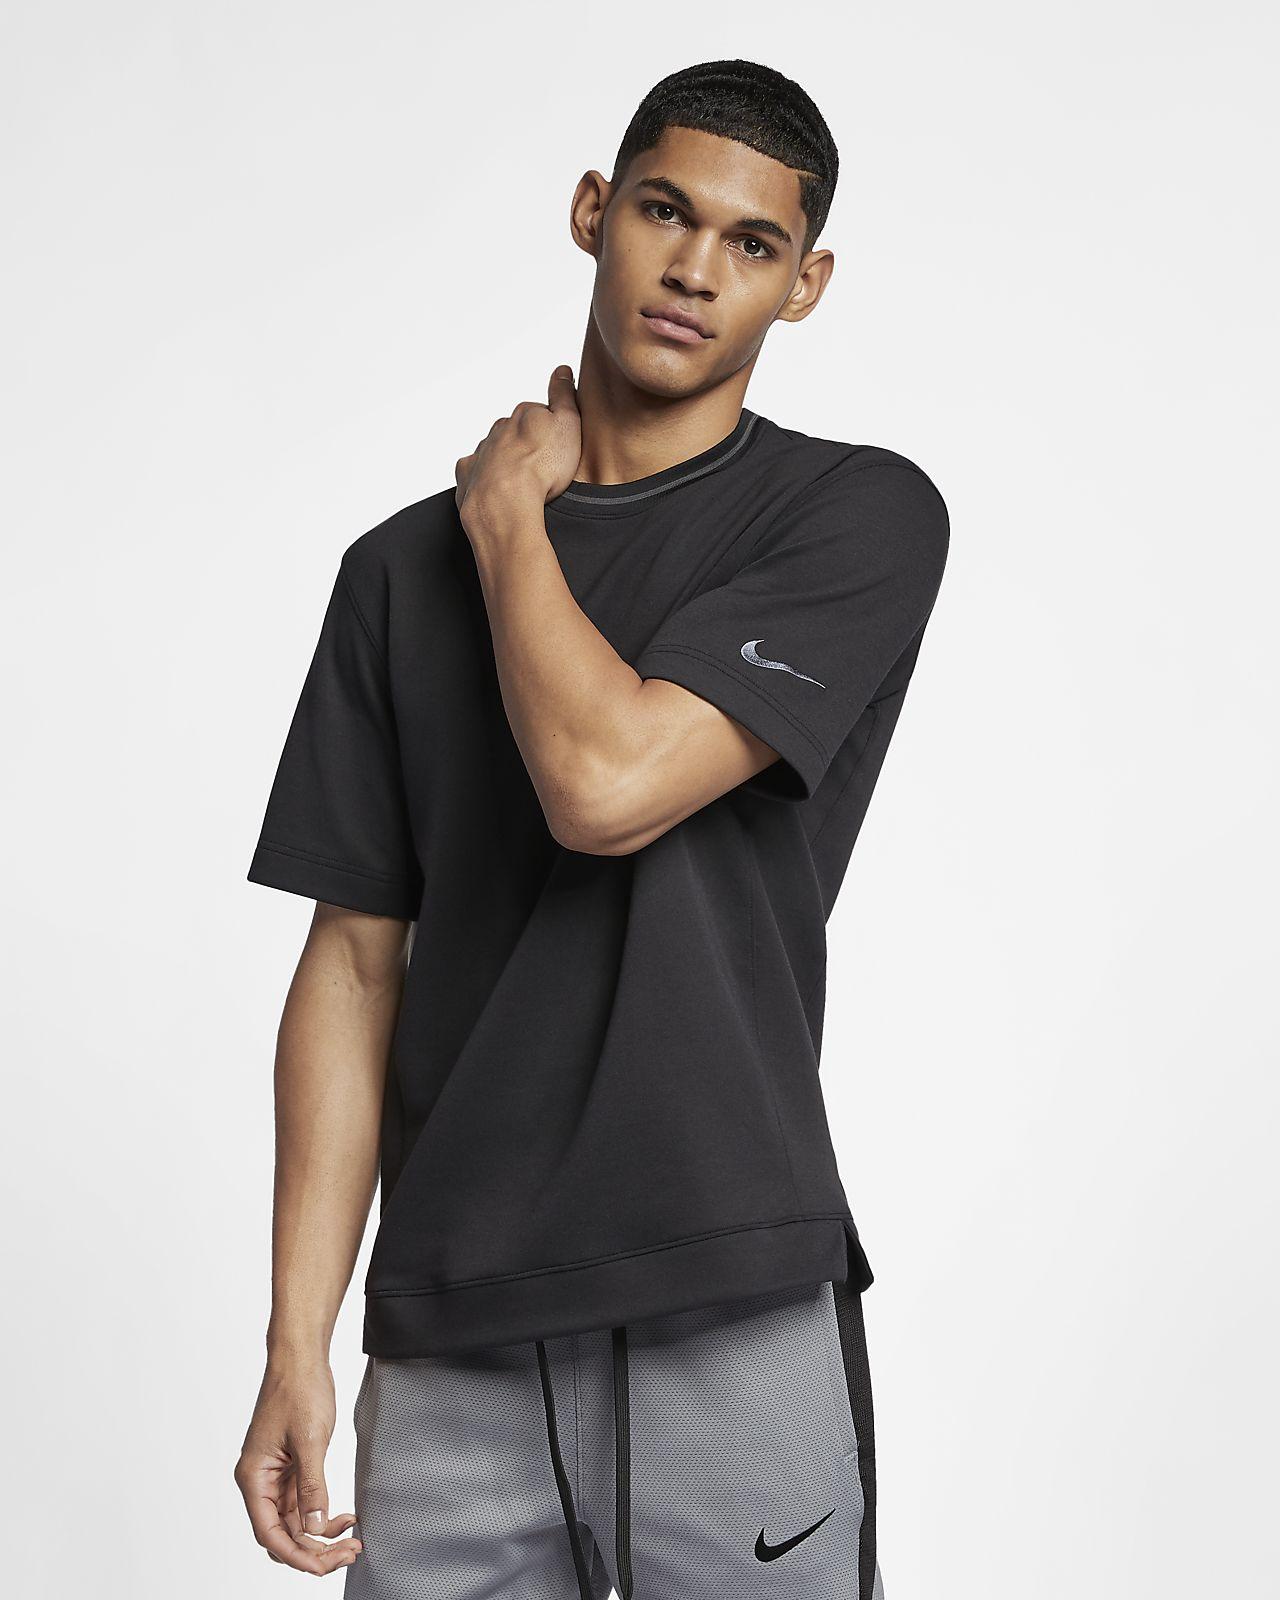 Nike Dri-FIT kortermet basketoverdel til herre